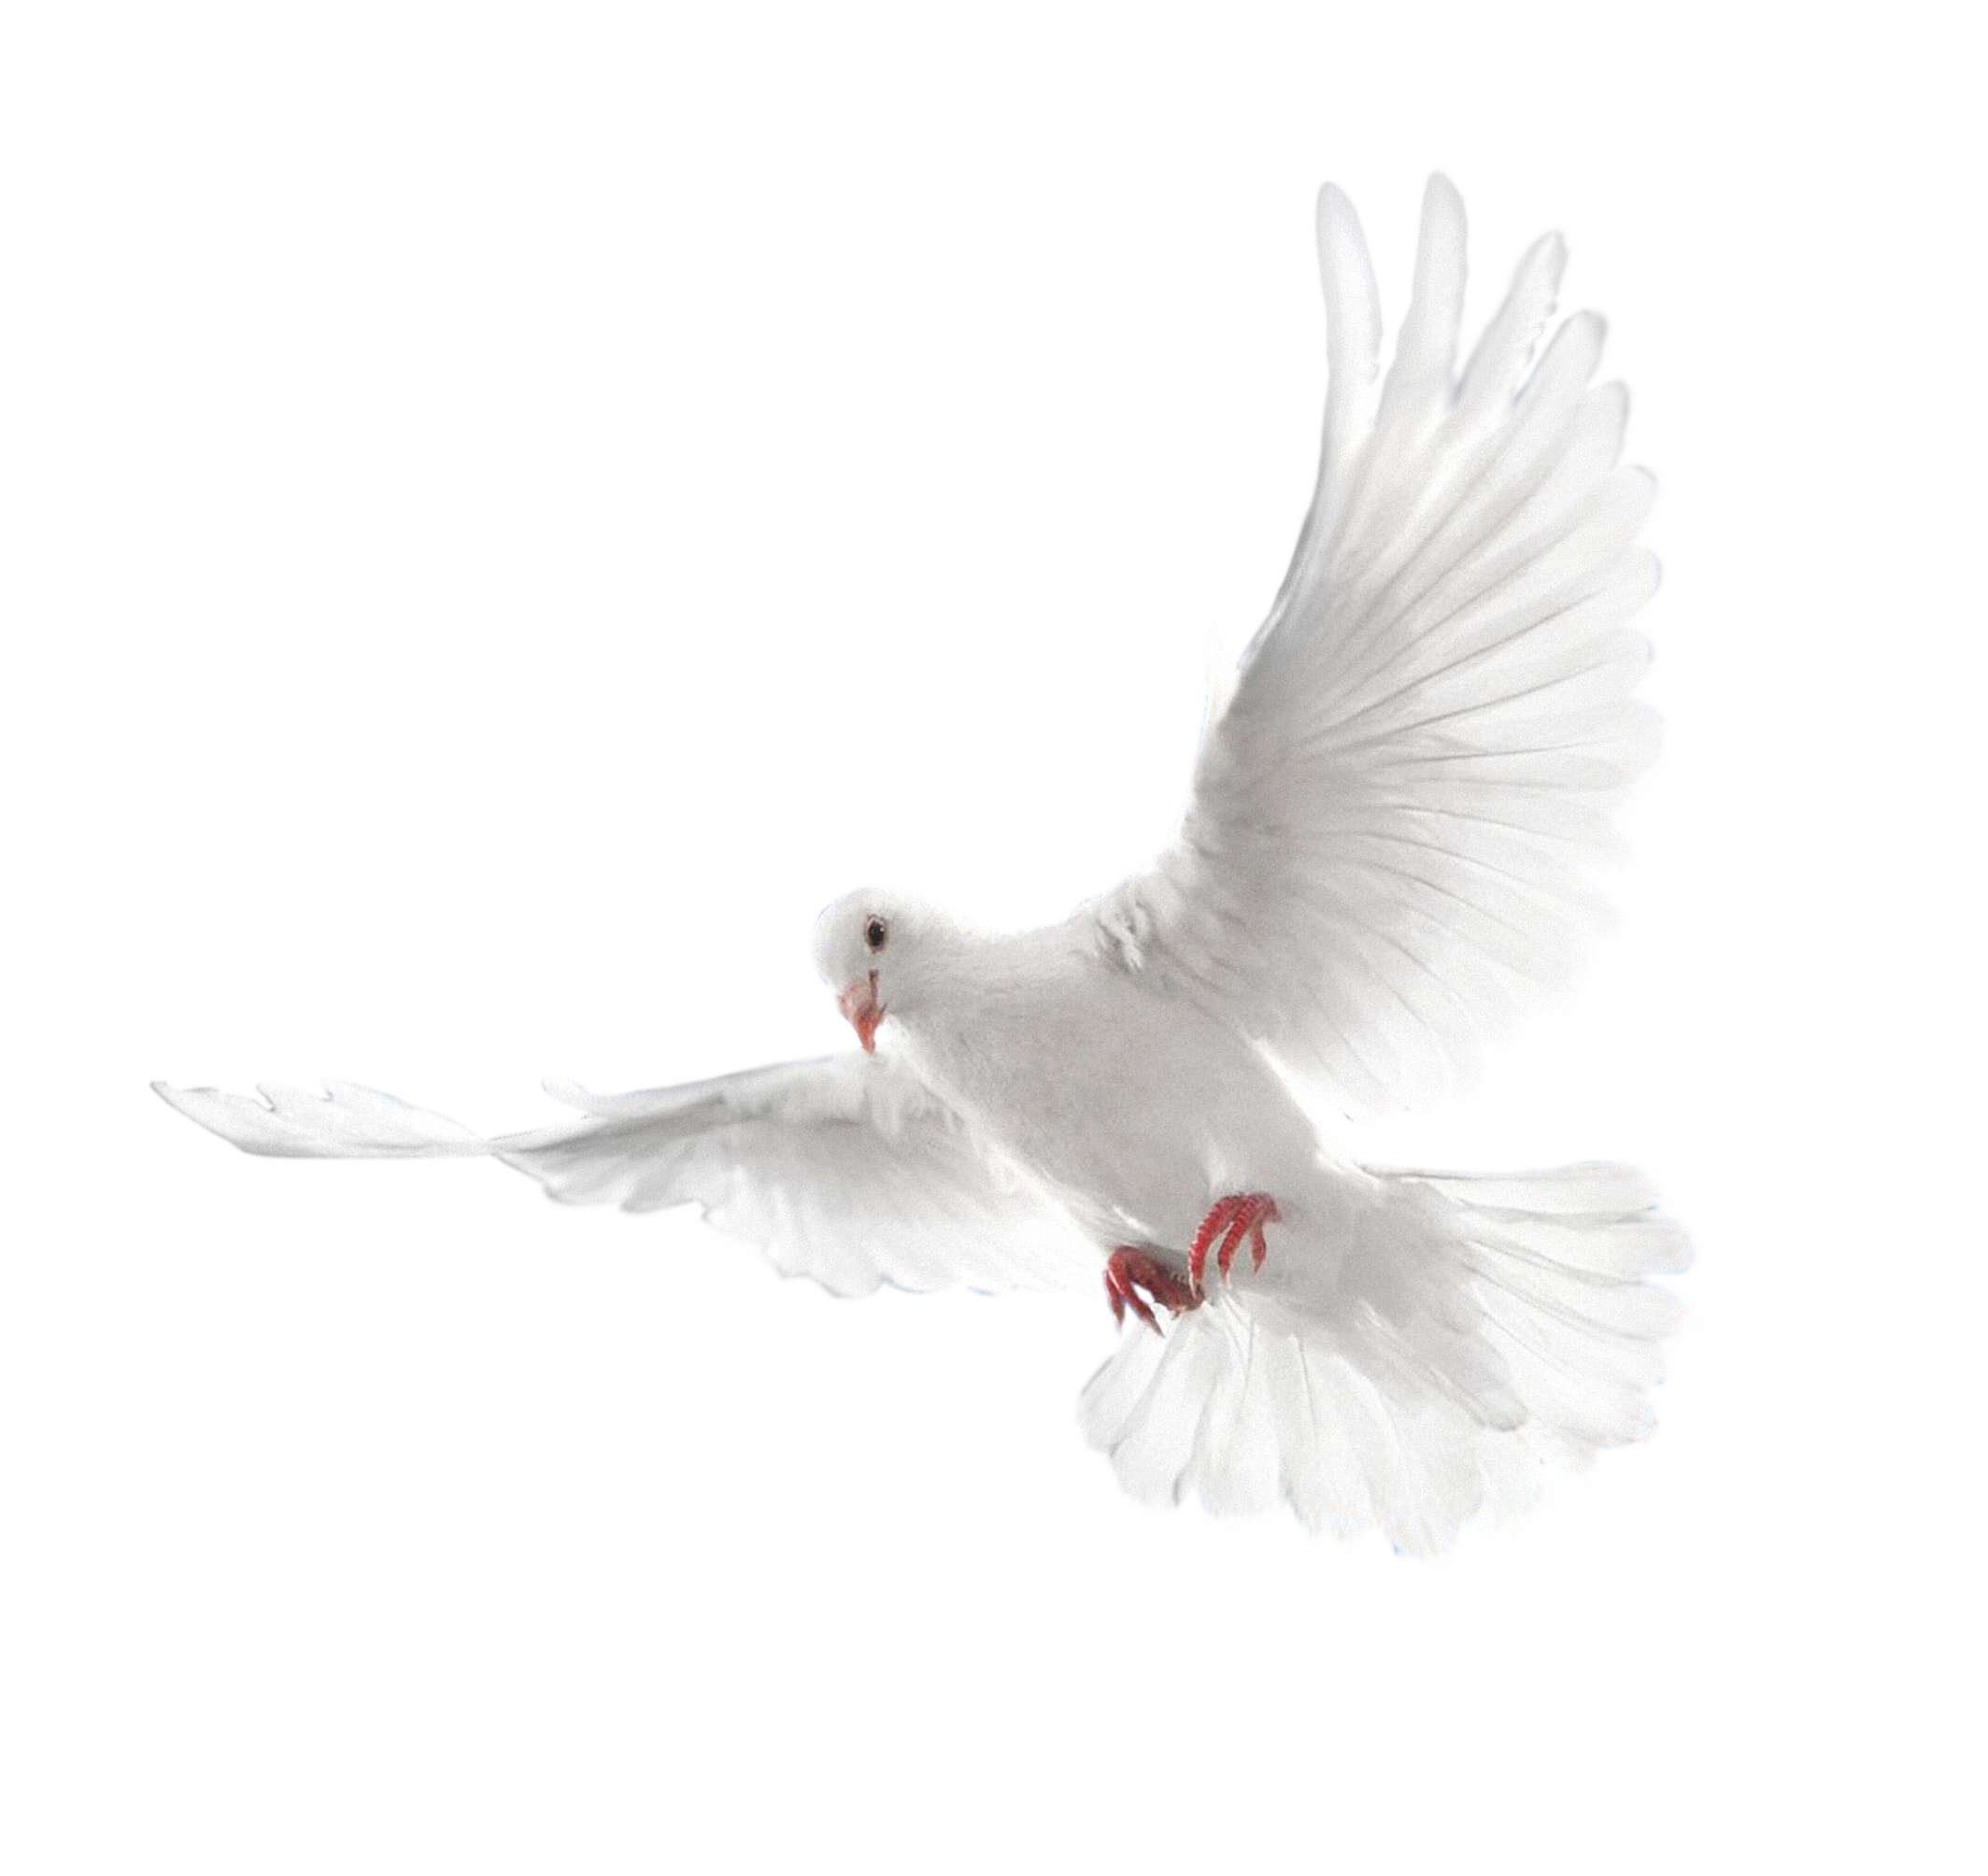 Pin De Javier Magdaleno En Imagenes Png Pinterest Pigeon Flying